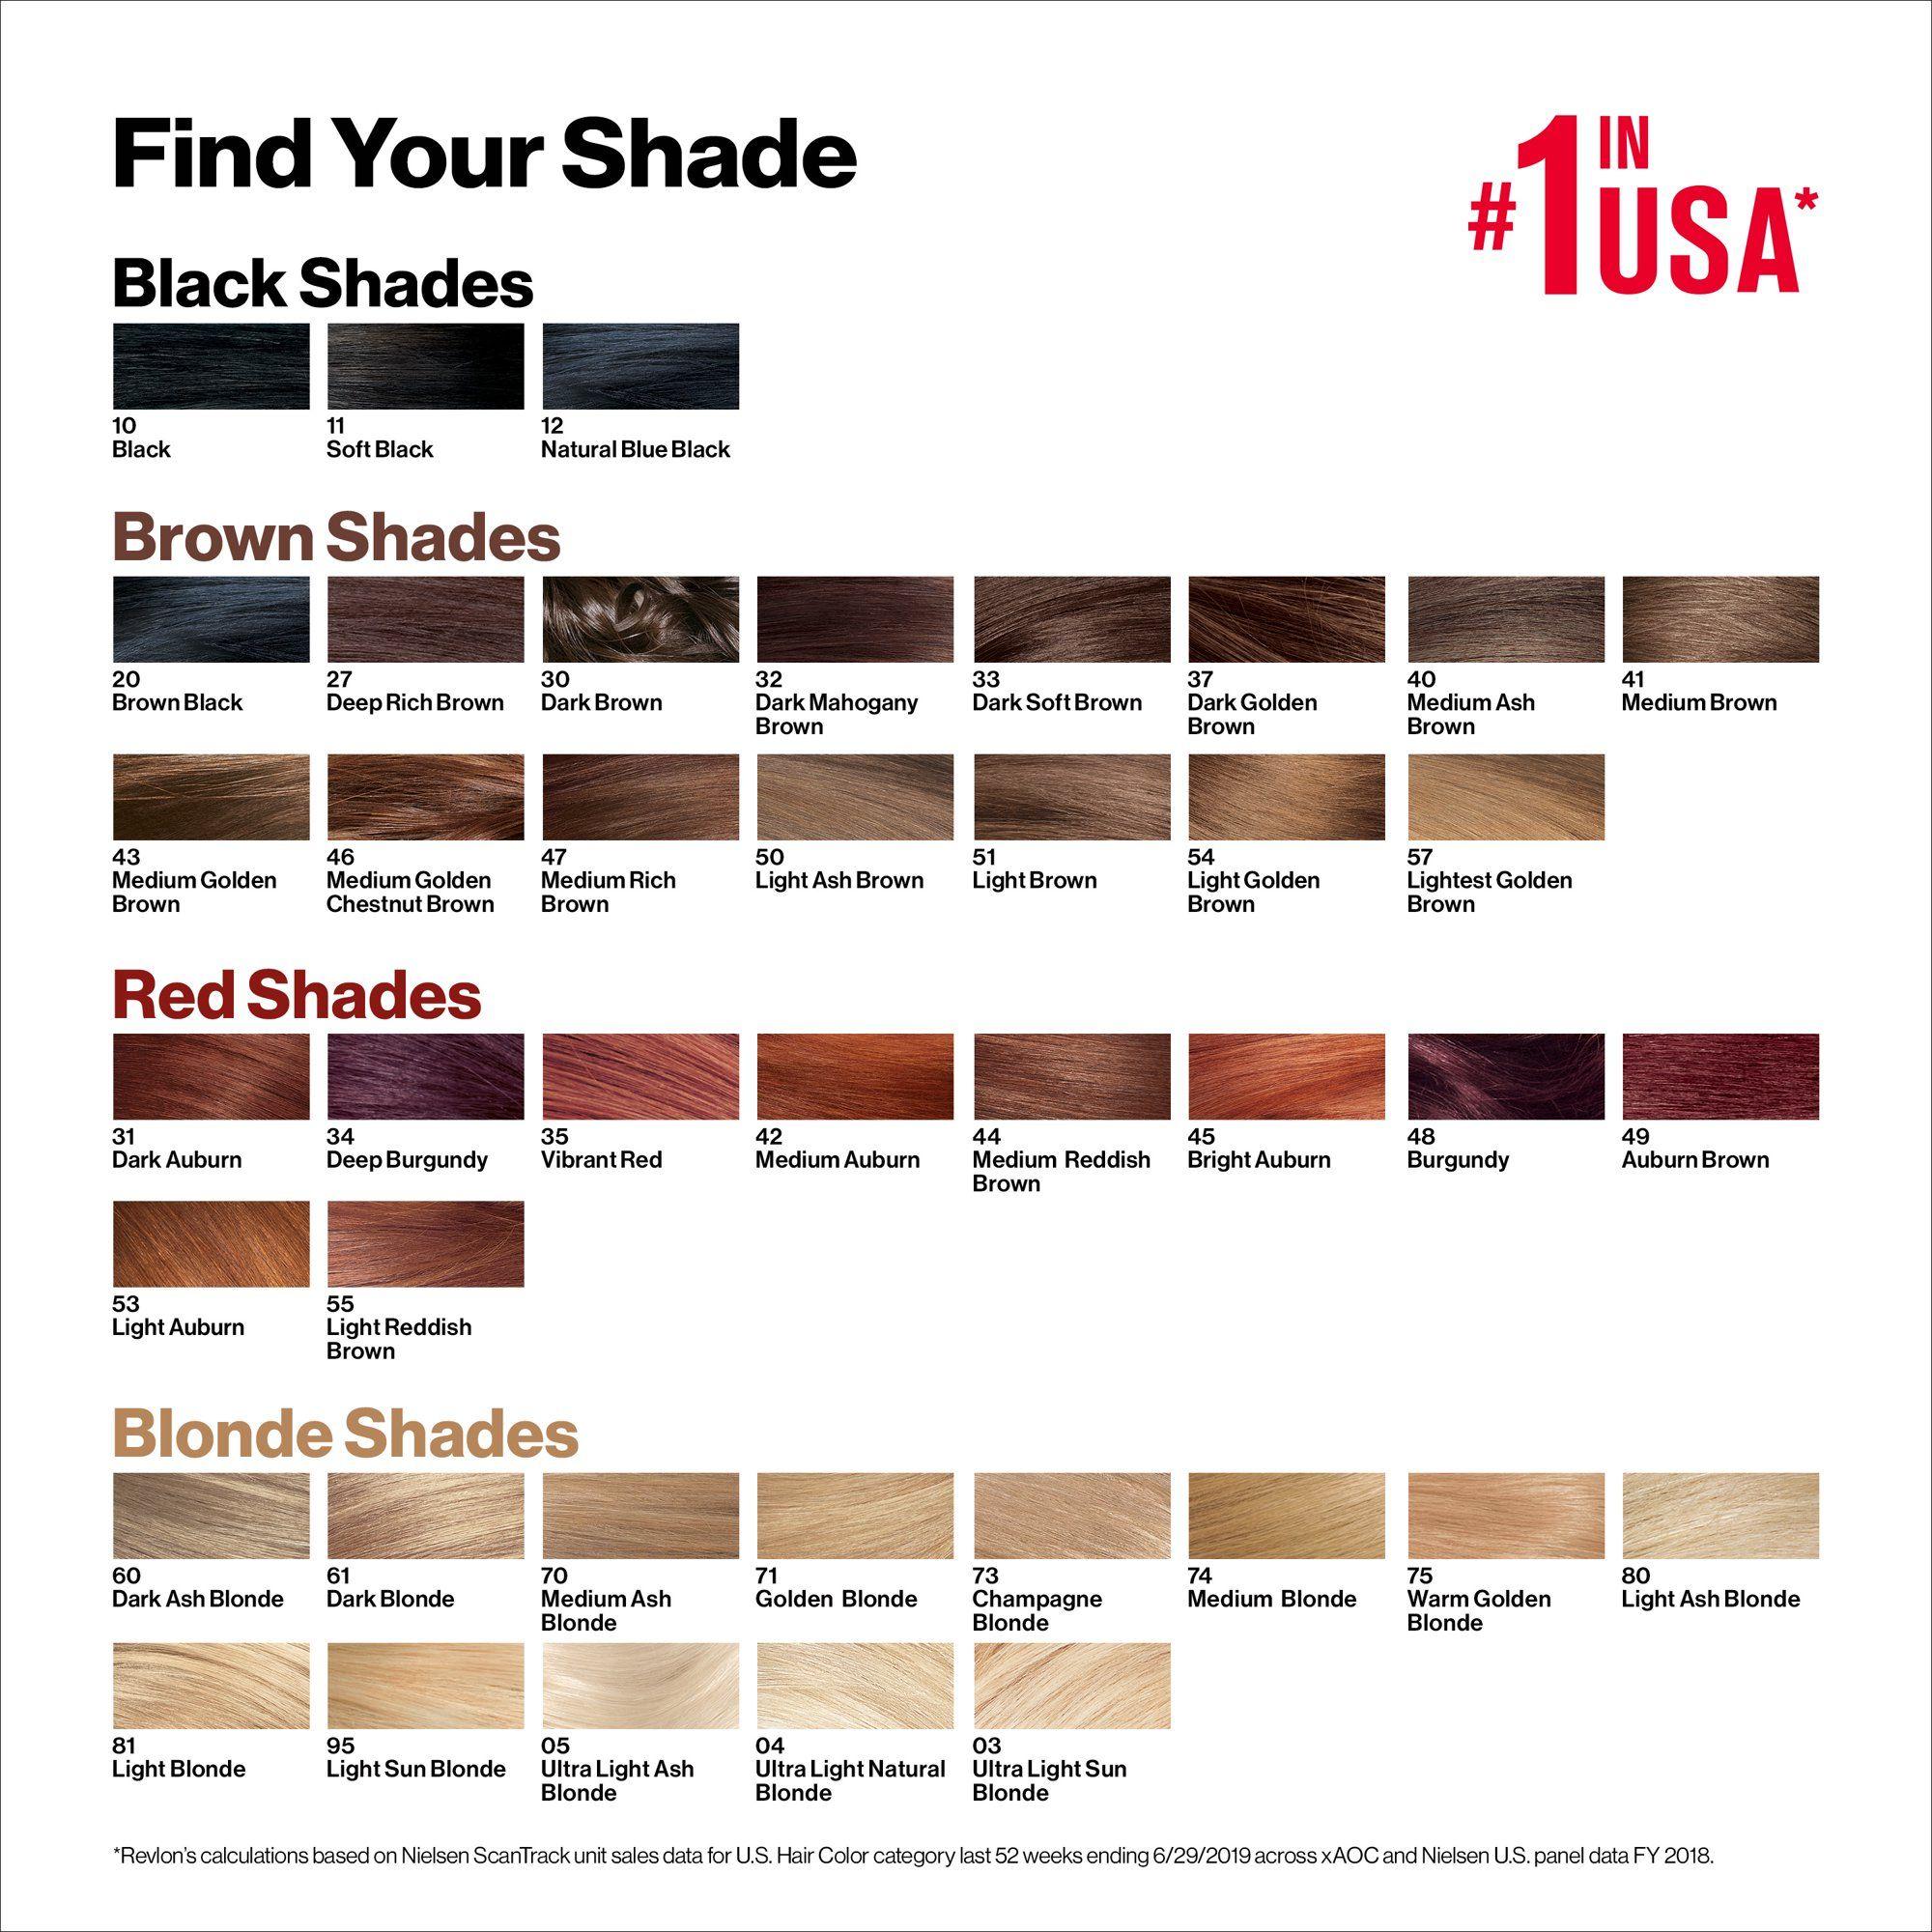 Revlon Colorsilk Beautiful Color Permanent Hair Dye With Keratin 100 Gray Coverage Ammonia Free 45 Bright Auburn Walmart Com In 2020 Permanent Hair Dye Brown Hair Color Chart Revlon Hair Color Chart